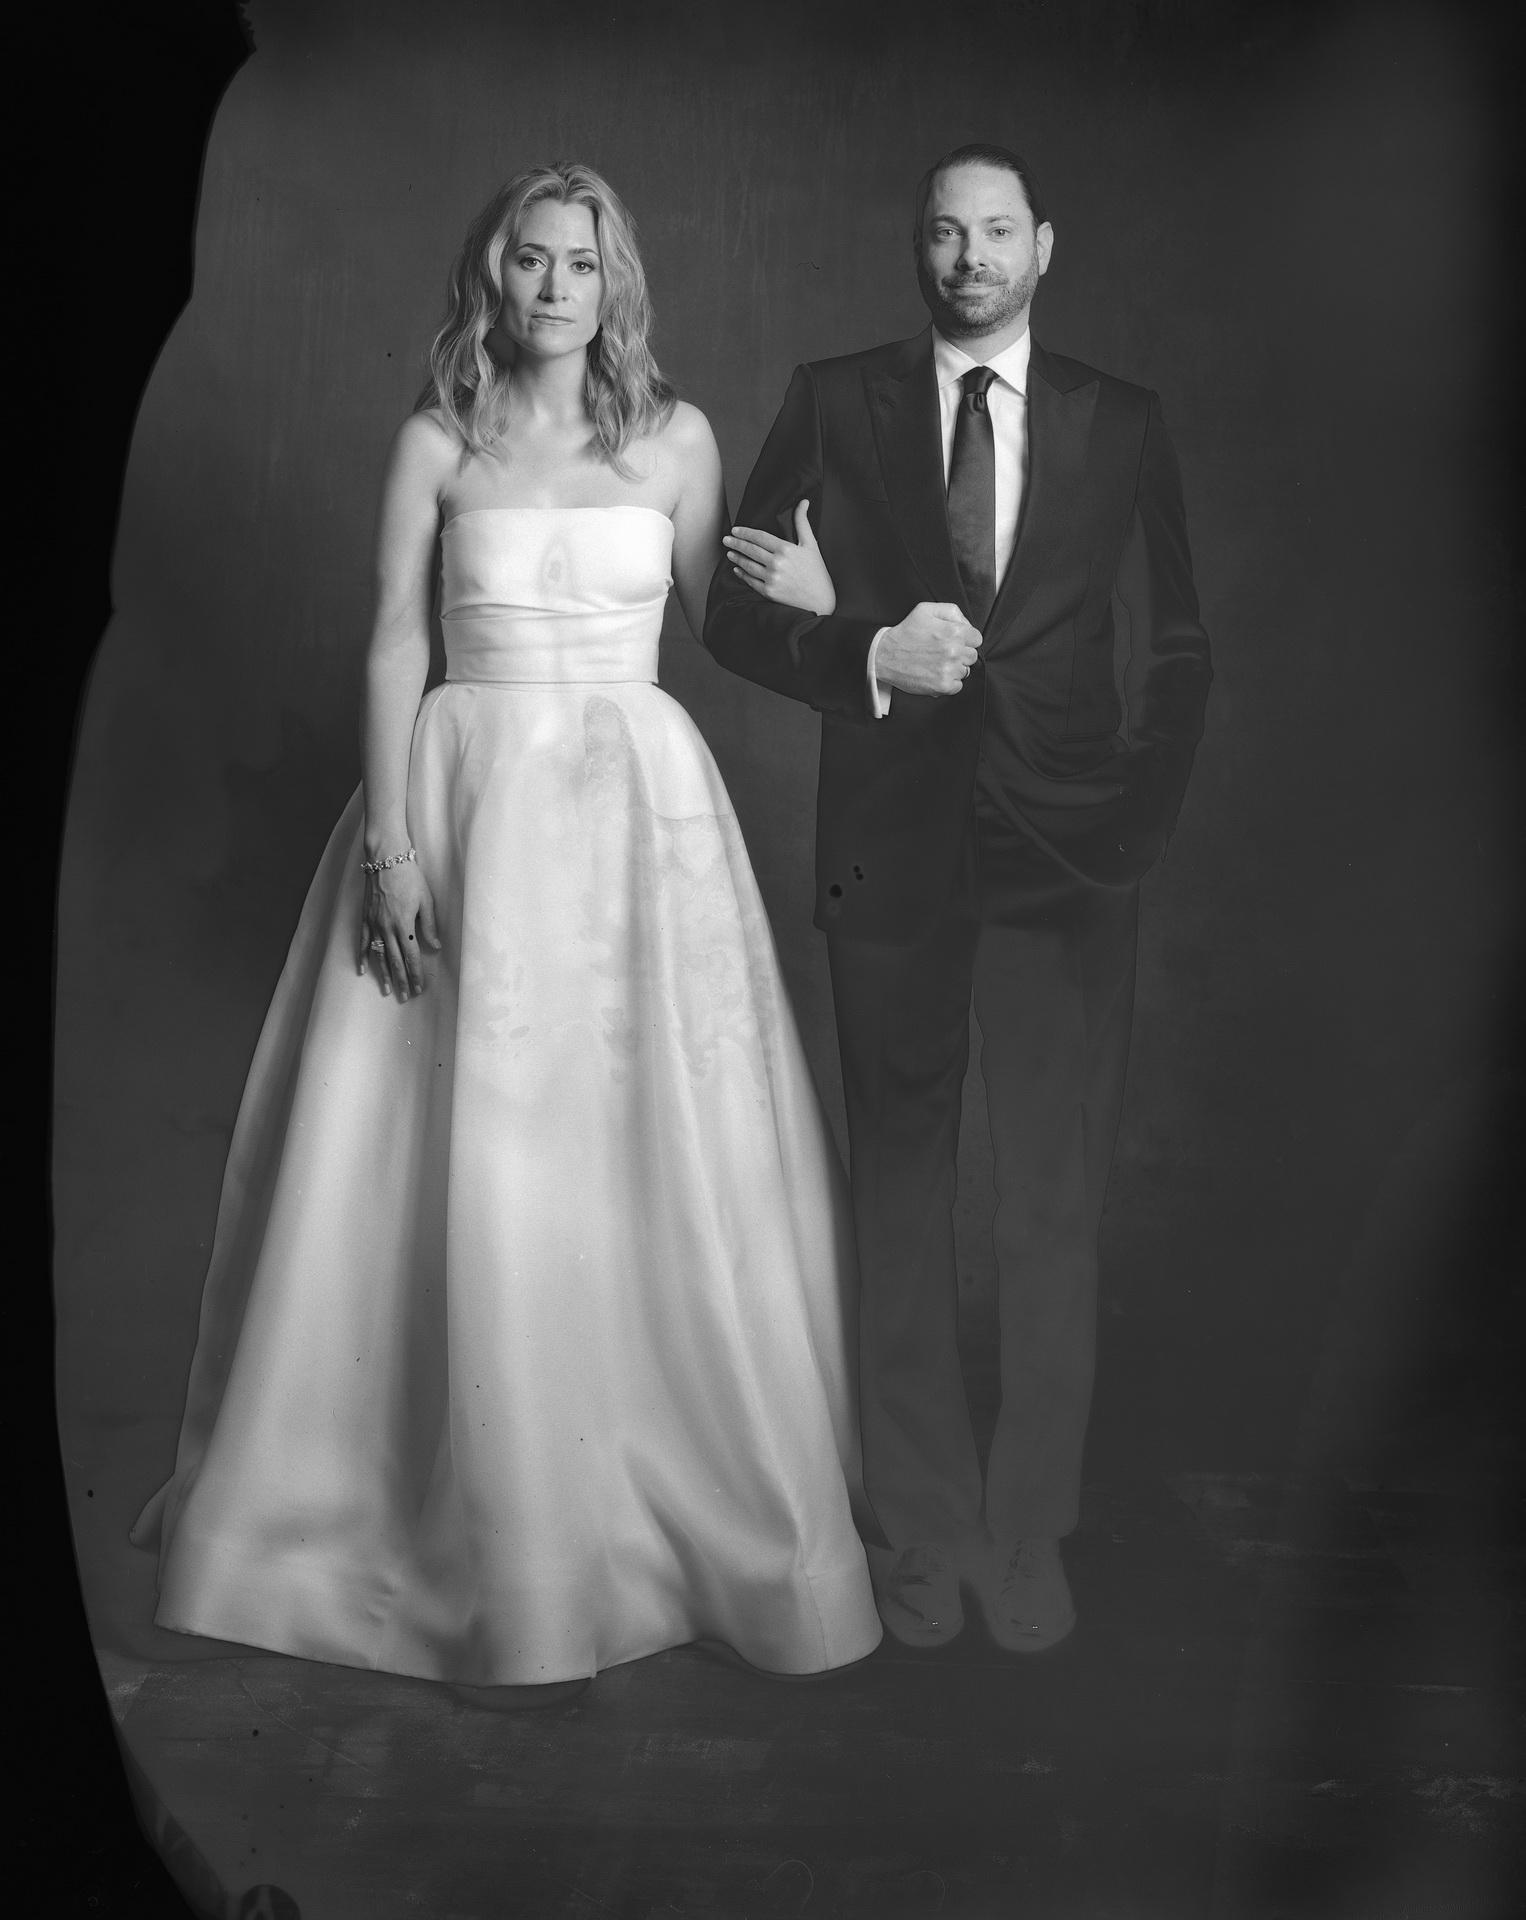 new 55 film bride and groom in the studio orange county